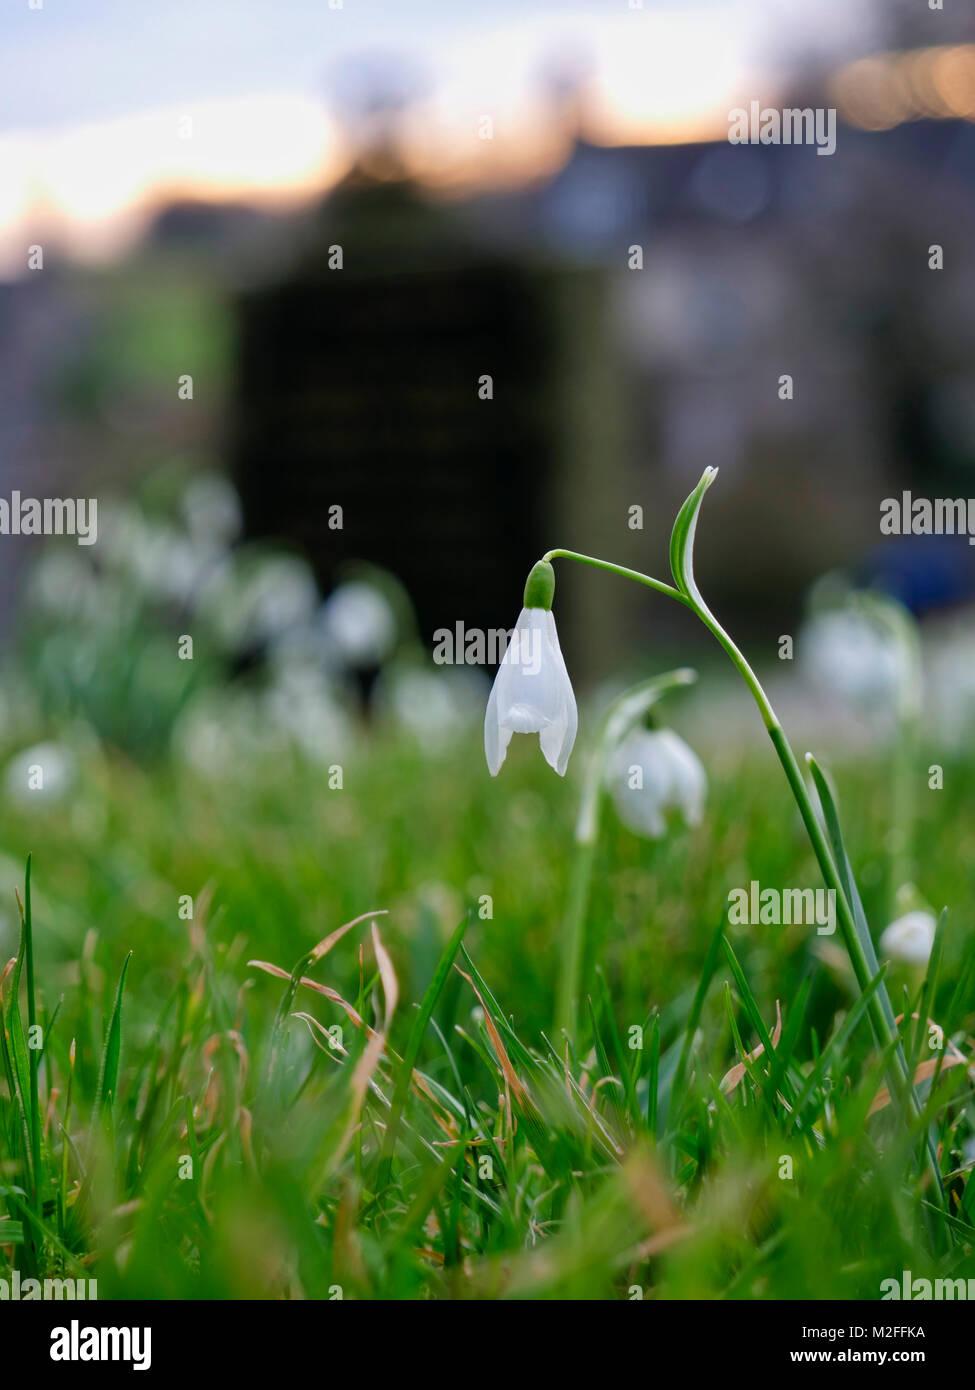 Tissington Village, Derbyshire. 7th Feb, 2018. UK Weather: Snowdrop flower in Tissington Village, Peak District National Park, Derbyshire, England, UK Credit: Doug Blane/Alamy Live News Stock Photo